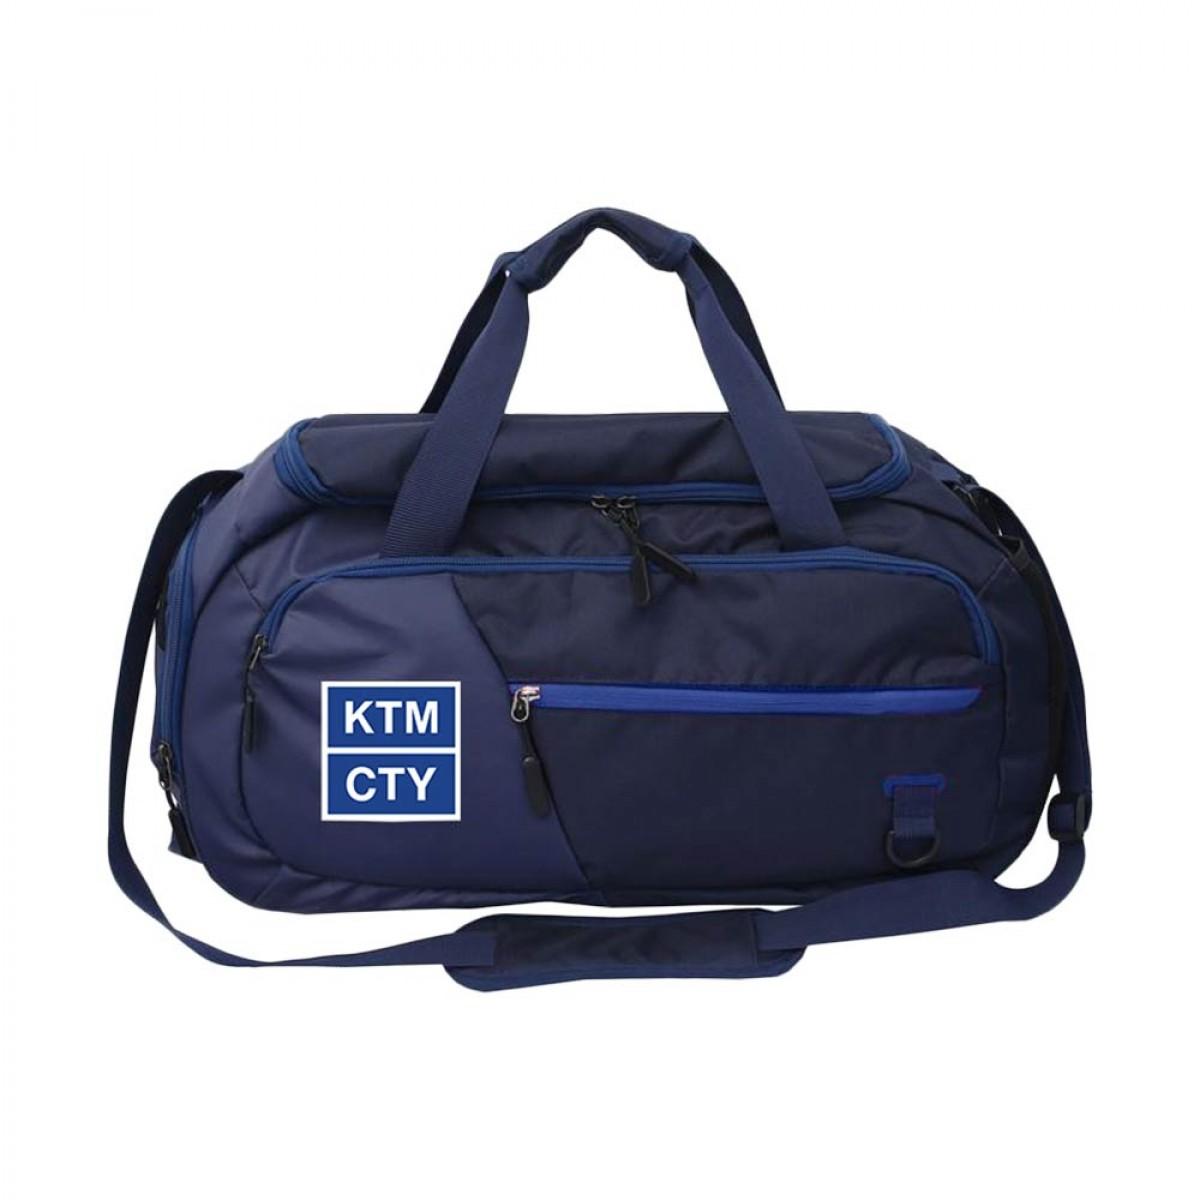 kit-bag-kb8-5